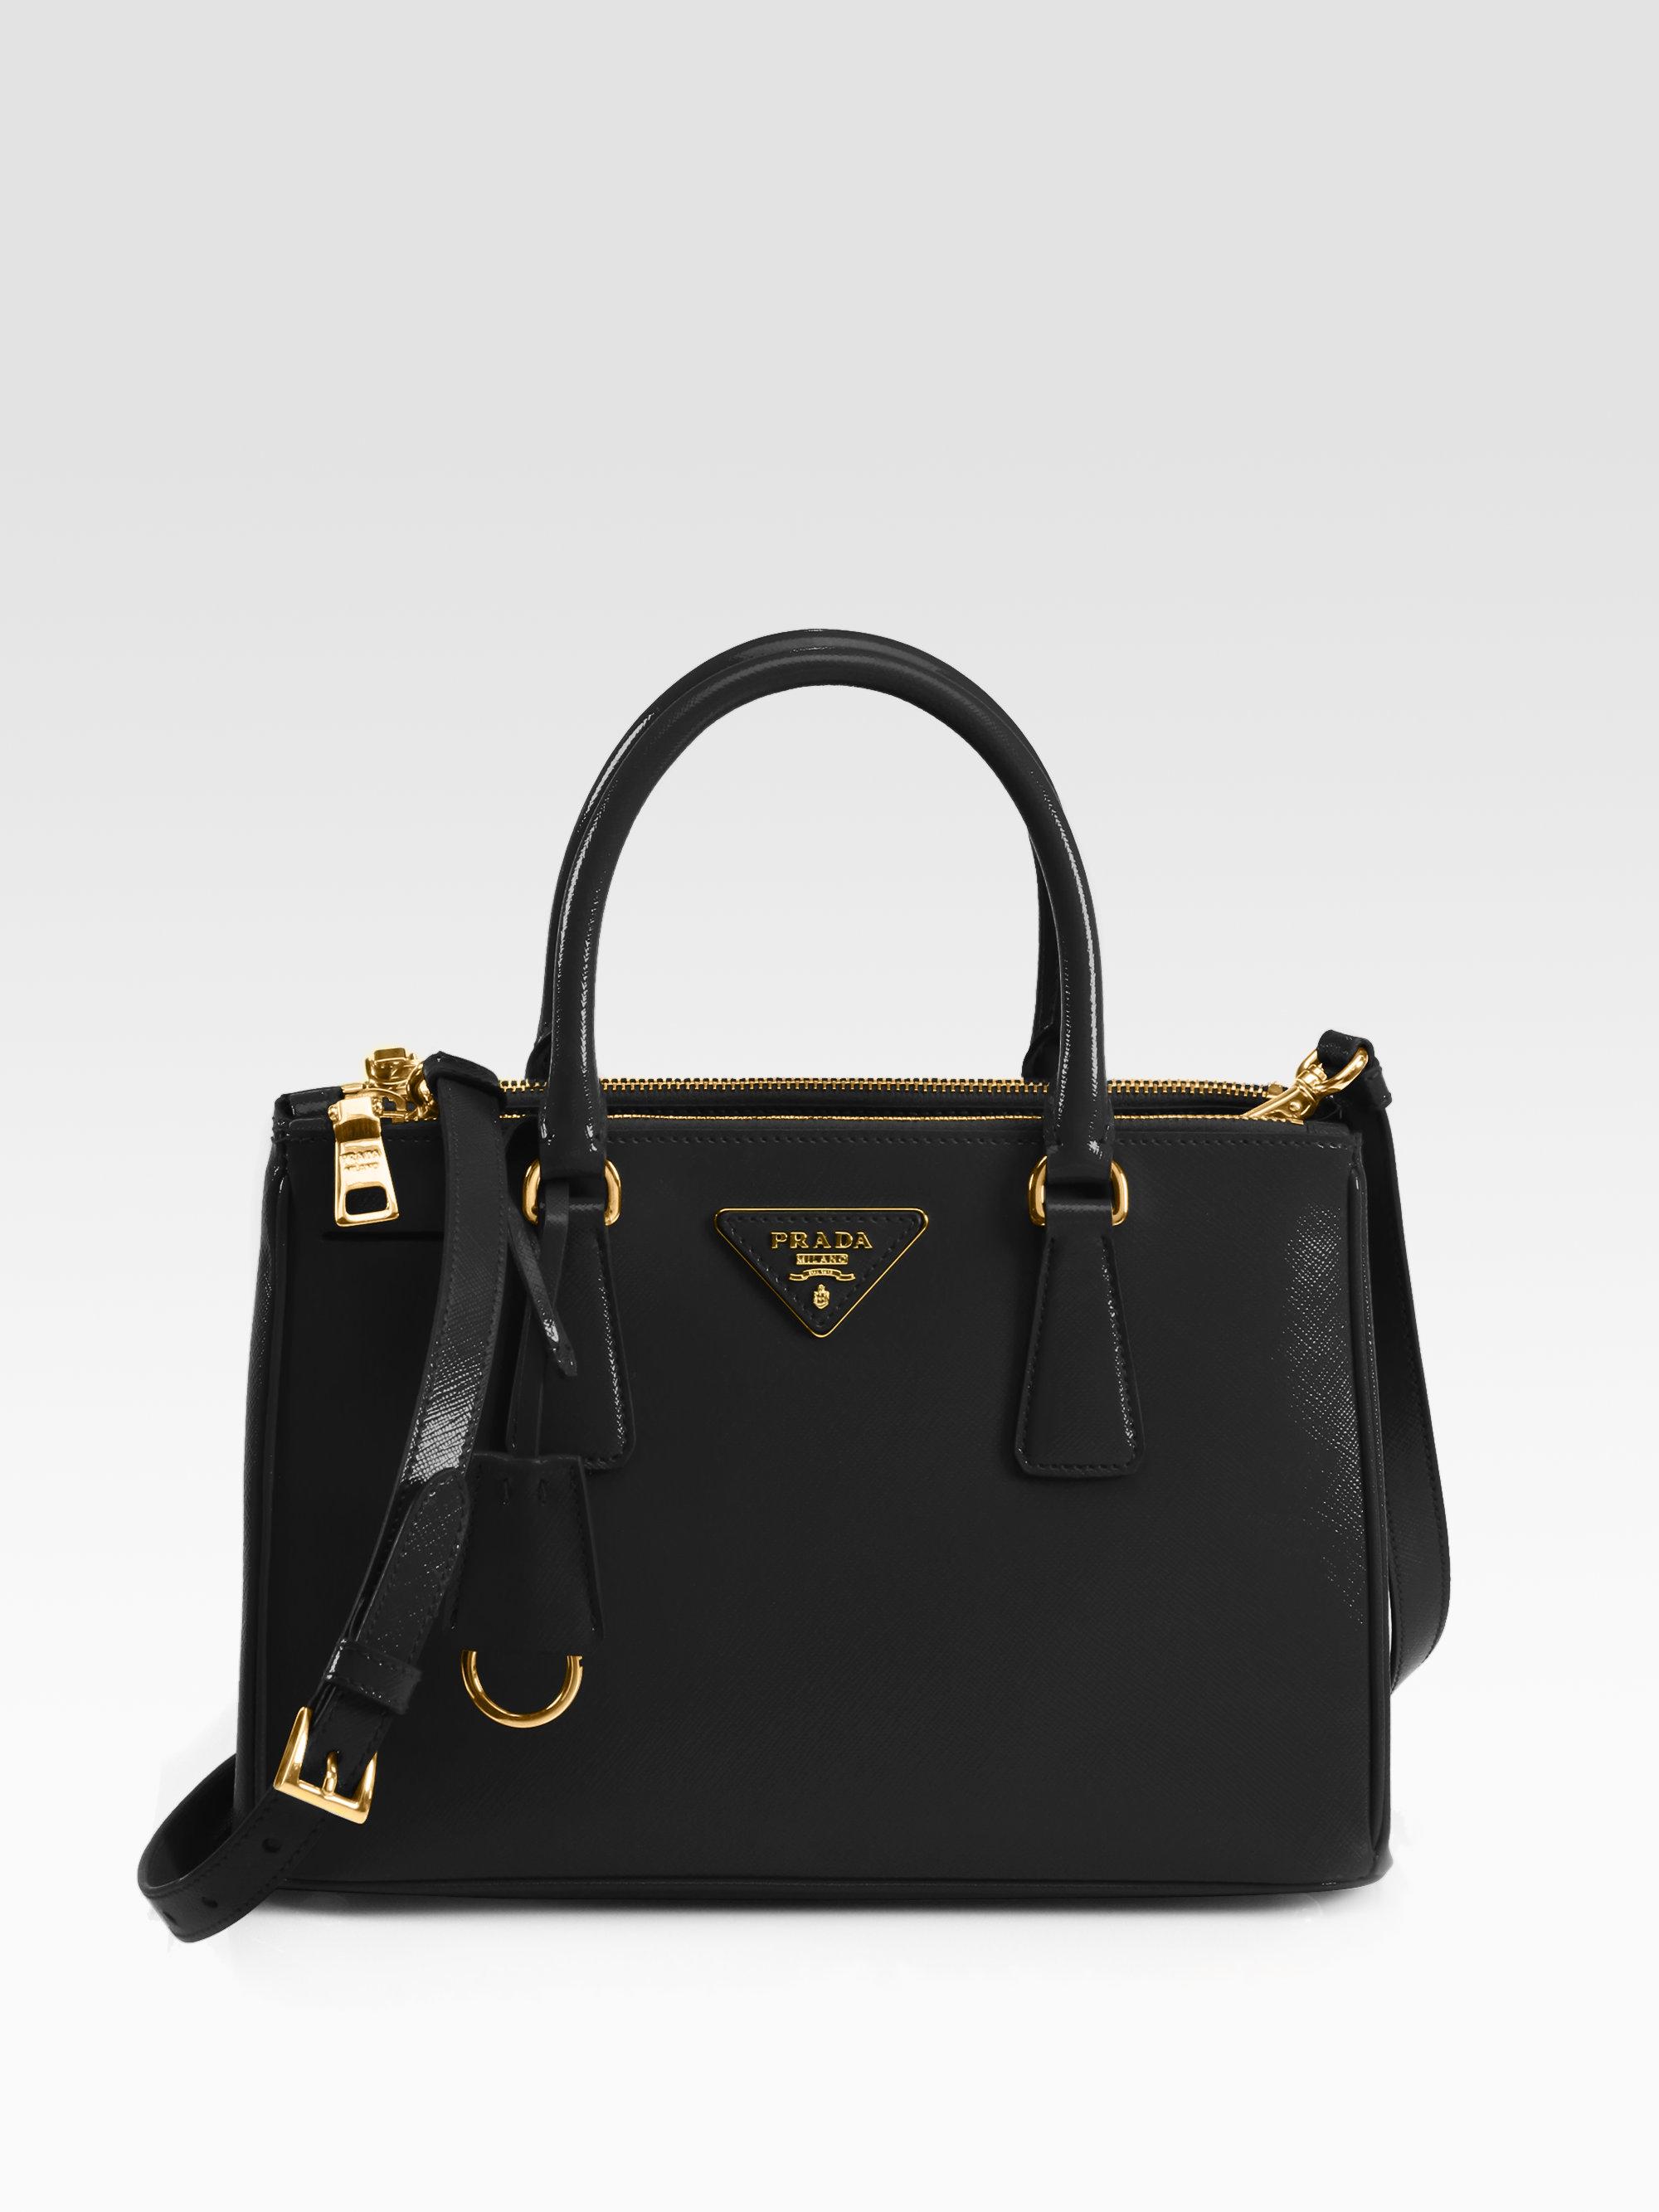 fake prada messenger bag - Prada Saffiano Vernice Tote in Black (nero-black) | Lyst